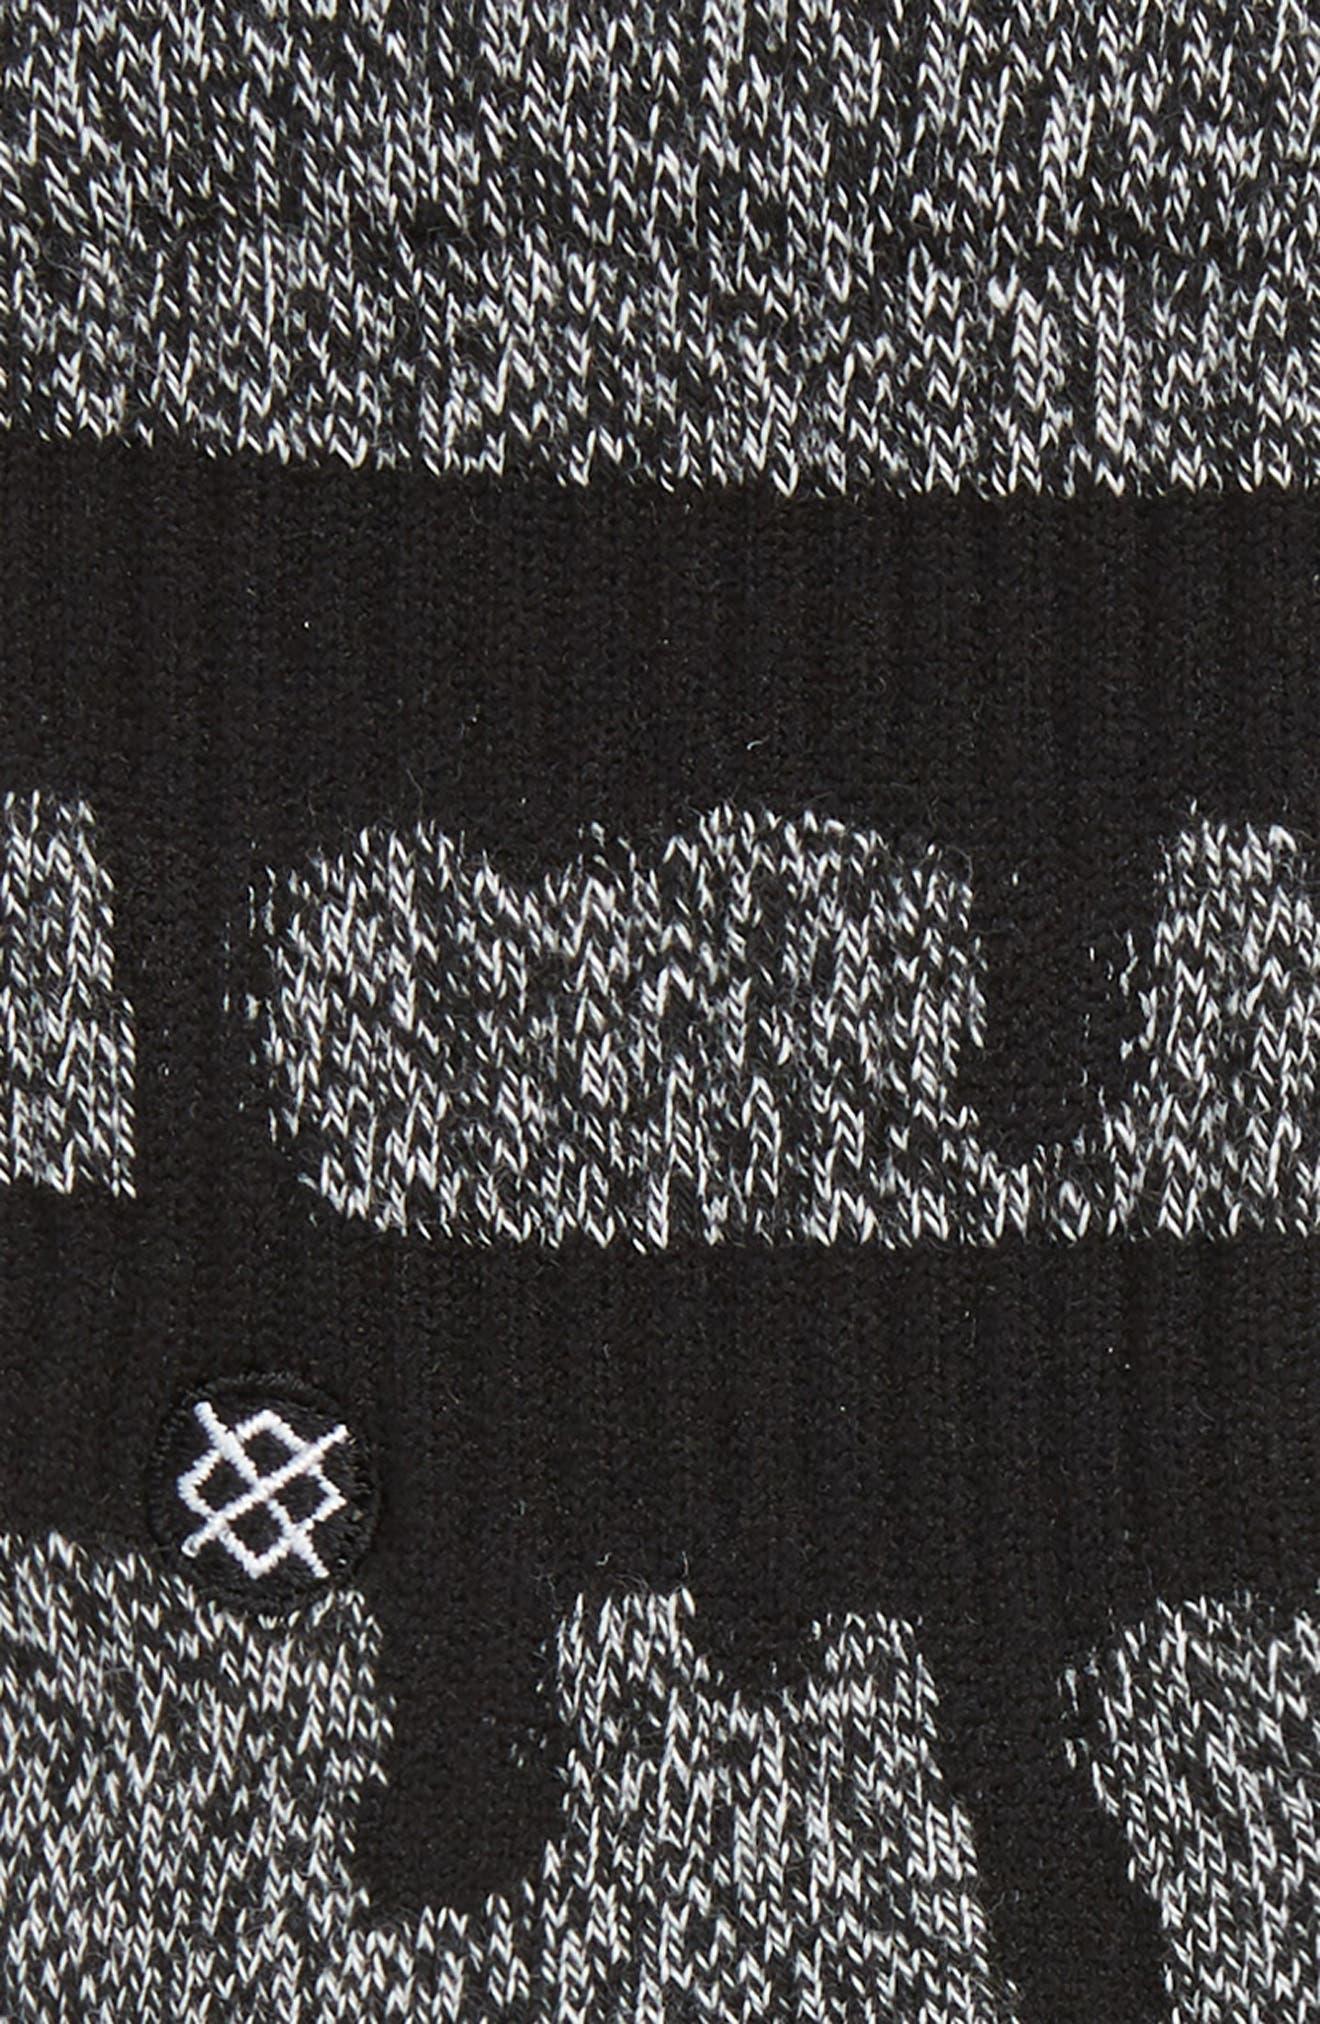 Drips Crew Socks,                             Alternate thumbnail 2, color,                             020